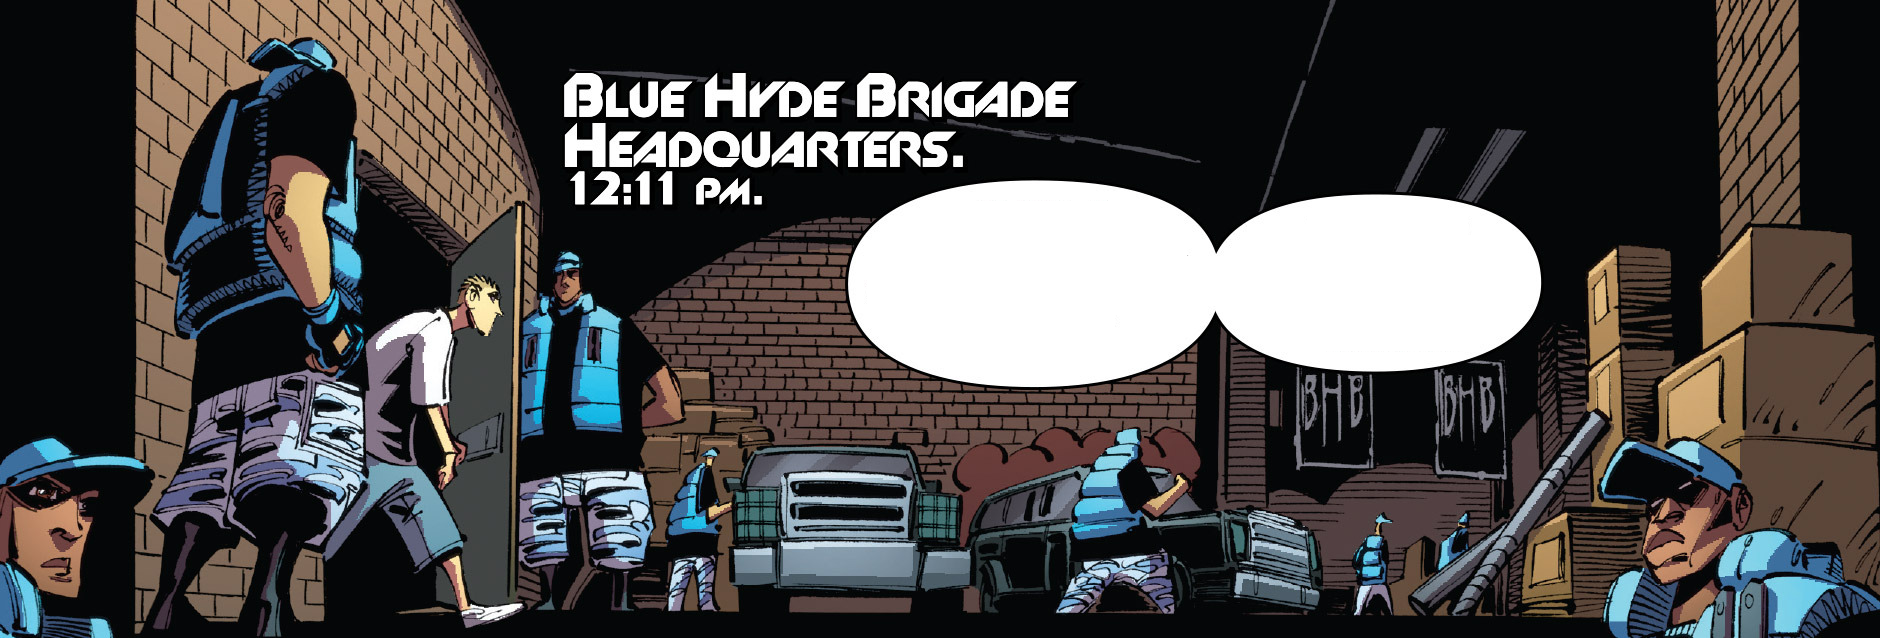 Blue Hyde Brigade Headquarters